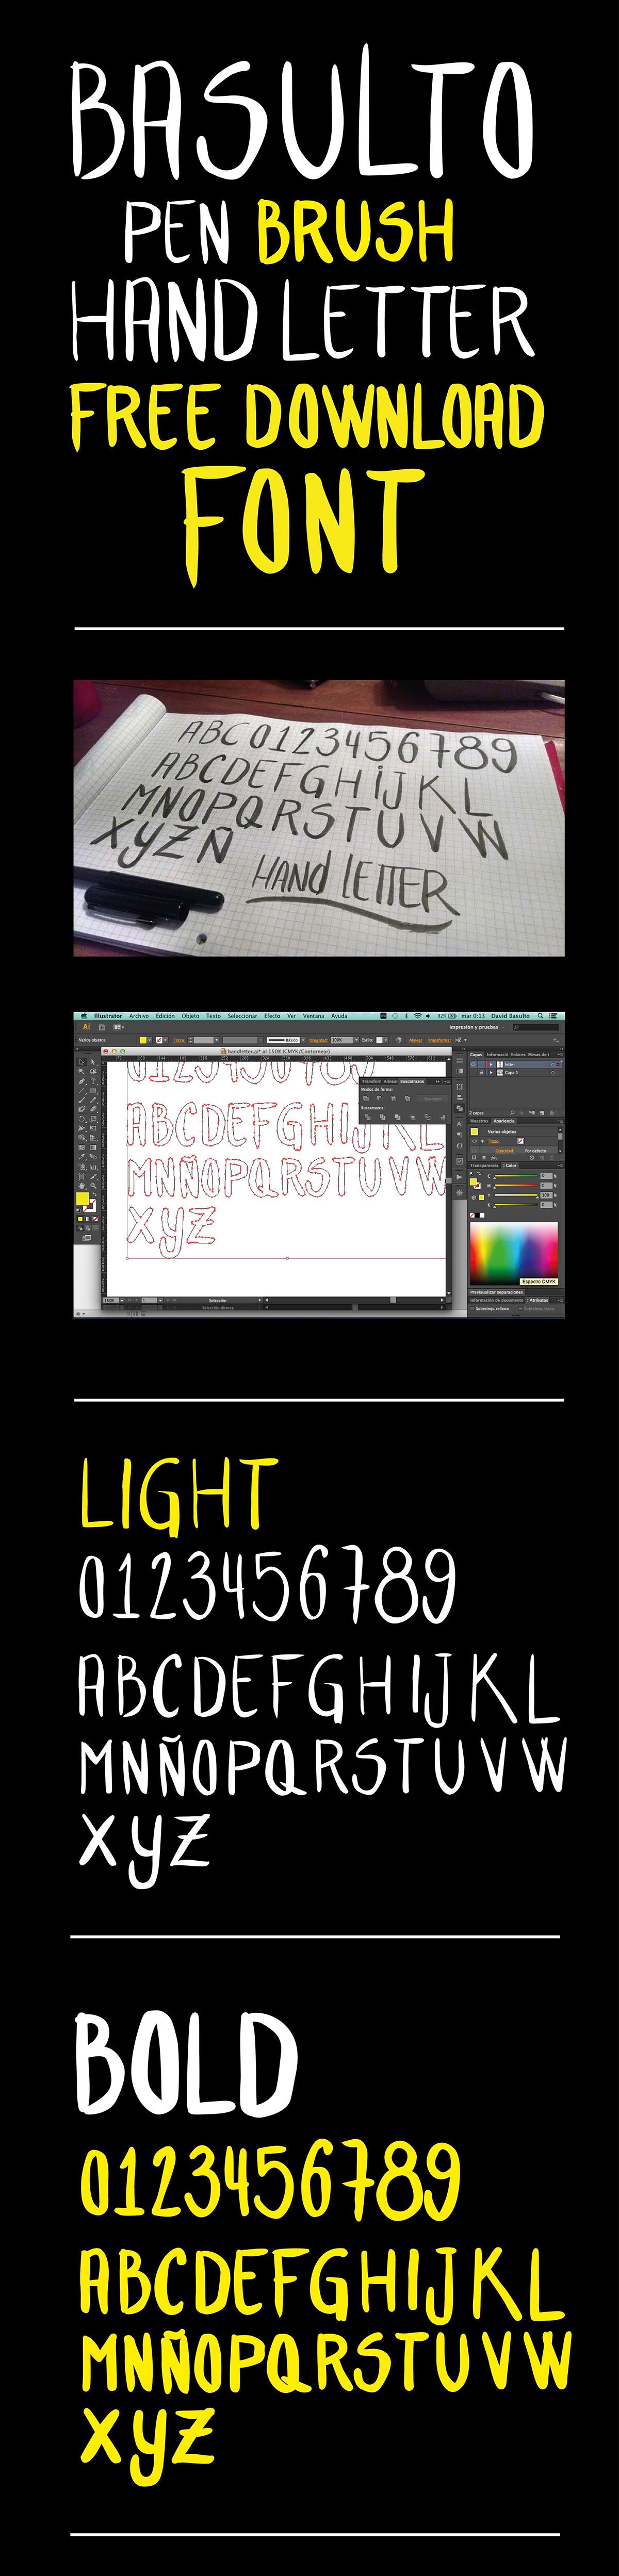 font tipografia hand letter letter hand draw free Free font free font download Hand font